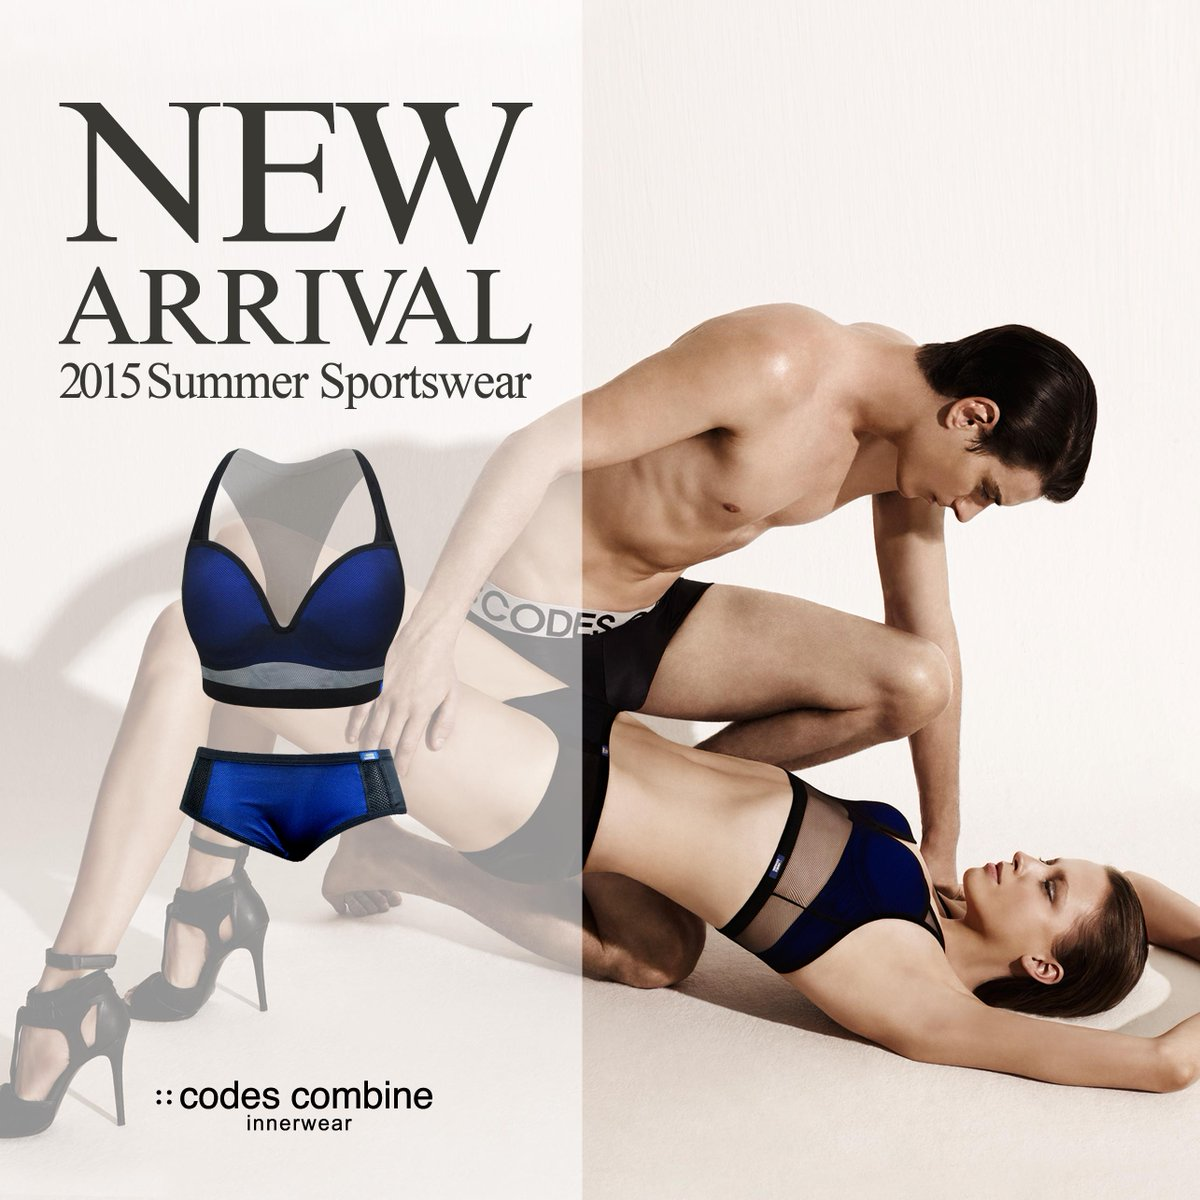 [::codescombine innerwear]코데즈컴바인이너웨어 스포츠 라인 출시~!! 스타일리시한 디자인과 기능성을 접목시켜, 스포티 하면서도 섹시한 감성의 아이템으로 매력적인 라인의 자신감 충전~!! http://t.co/cqUJlZY9hn